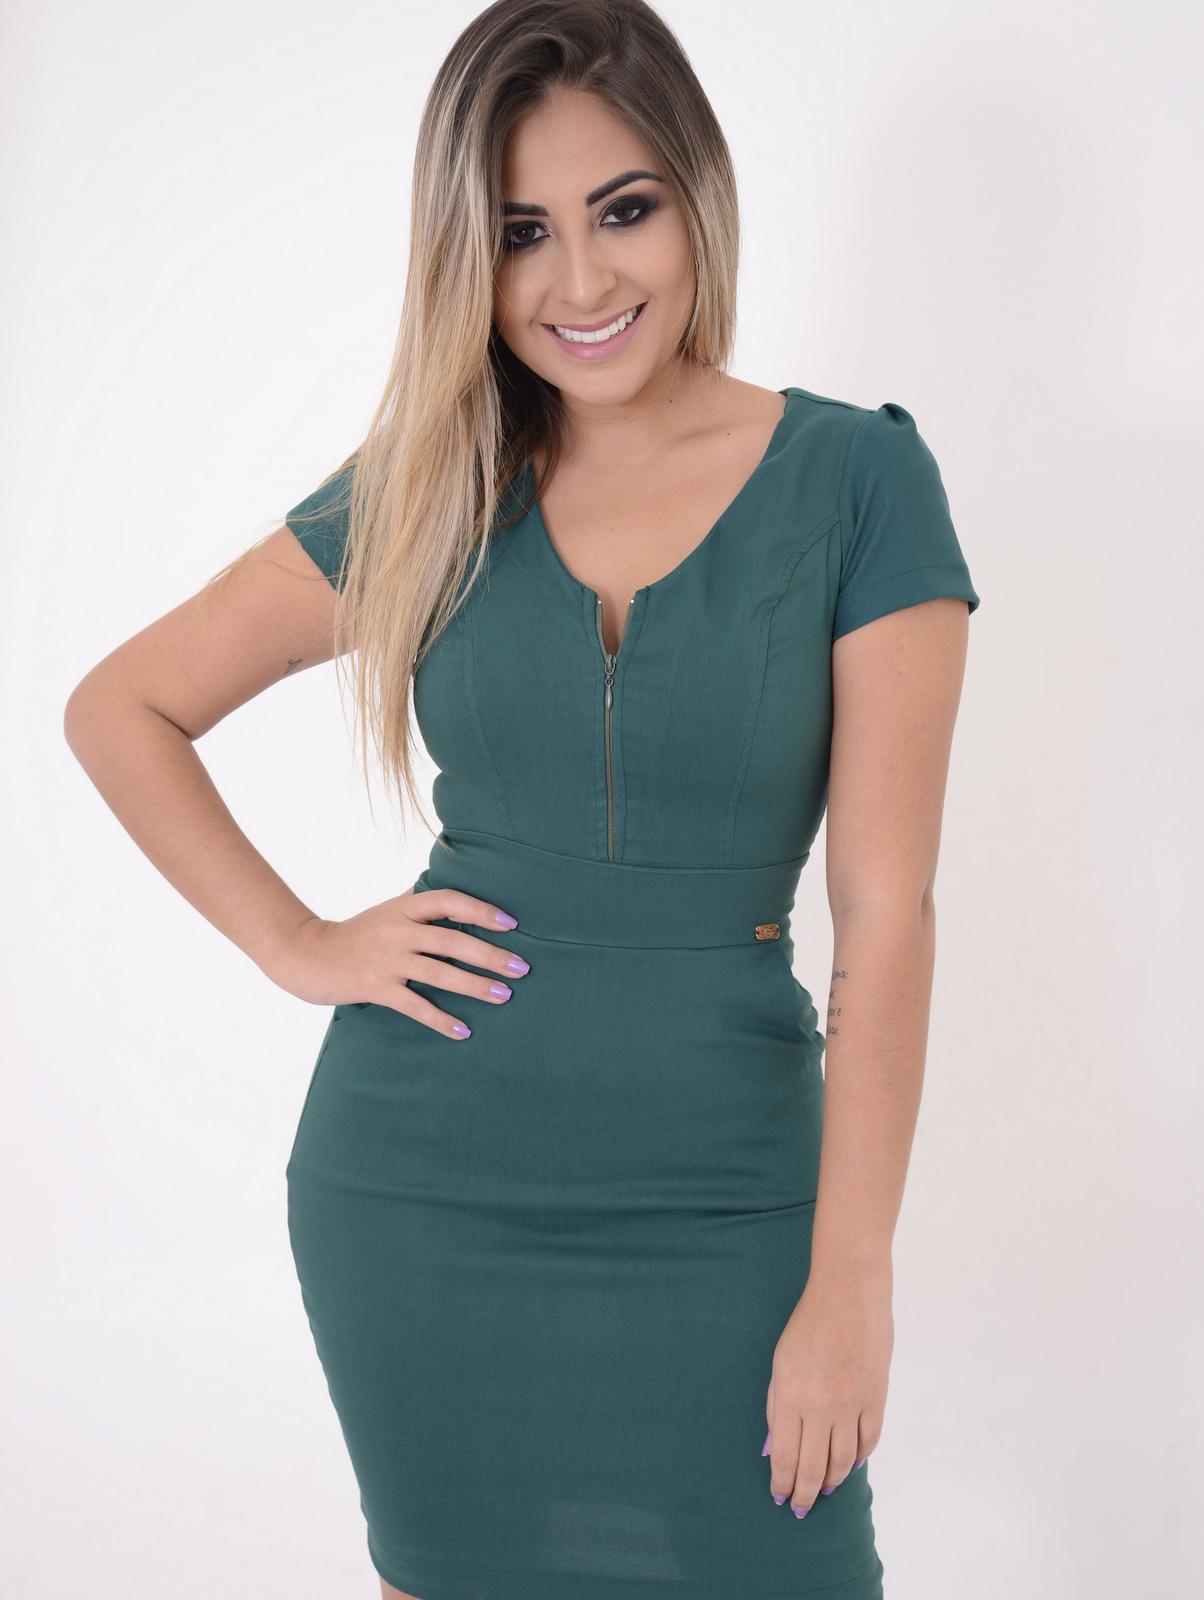 modelo vestindo Vestido Juliana com estampa verde militar